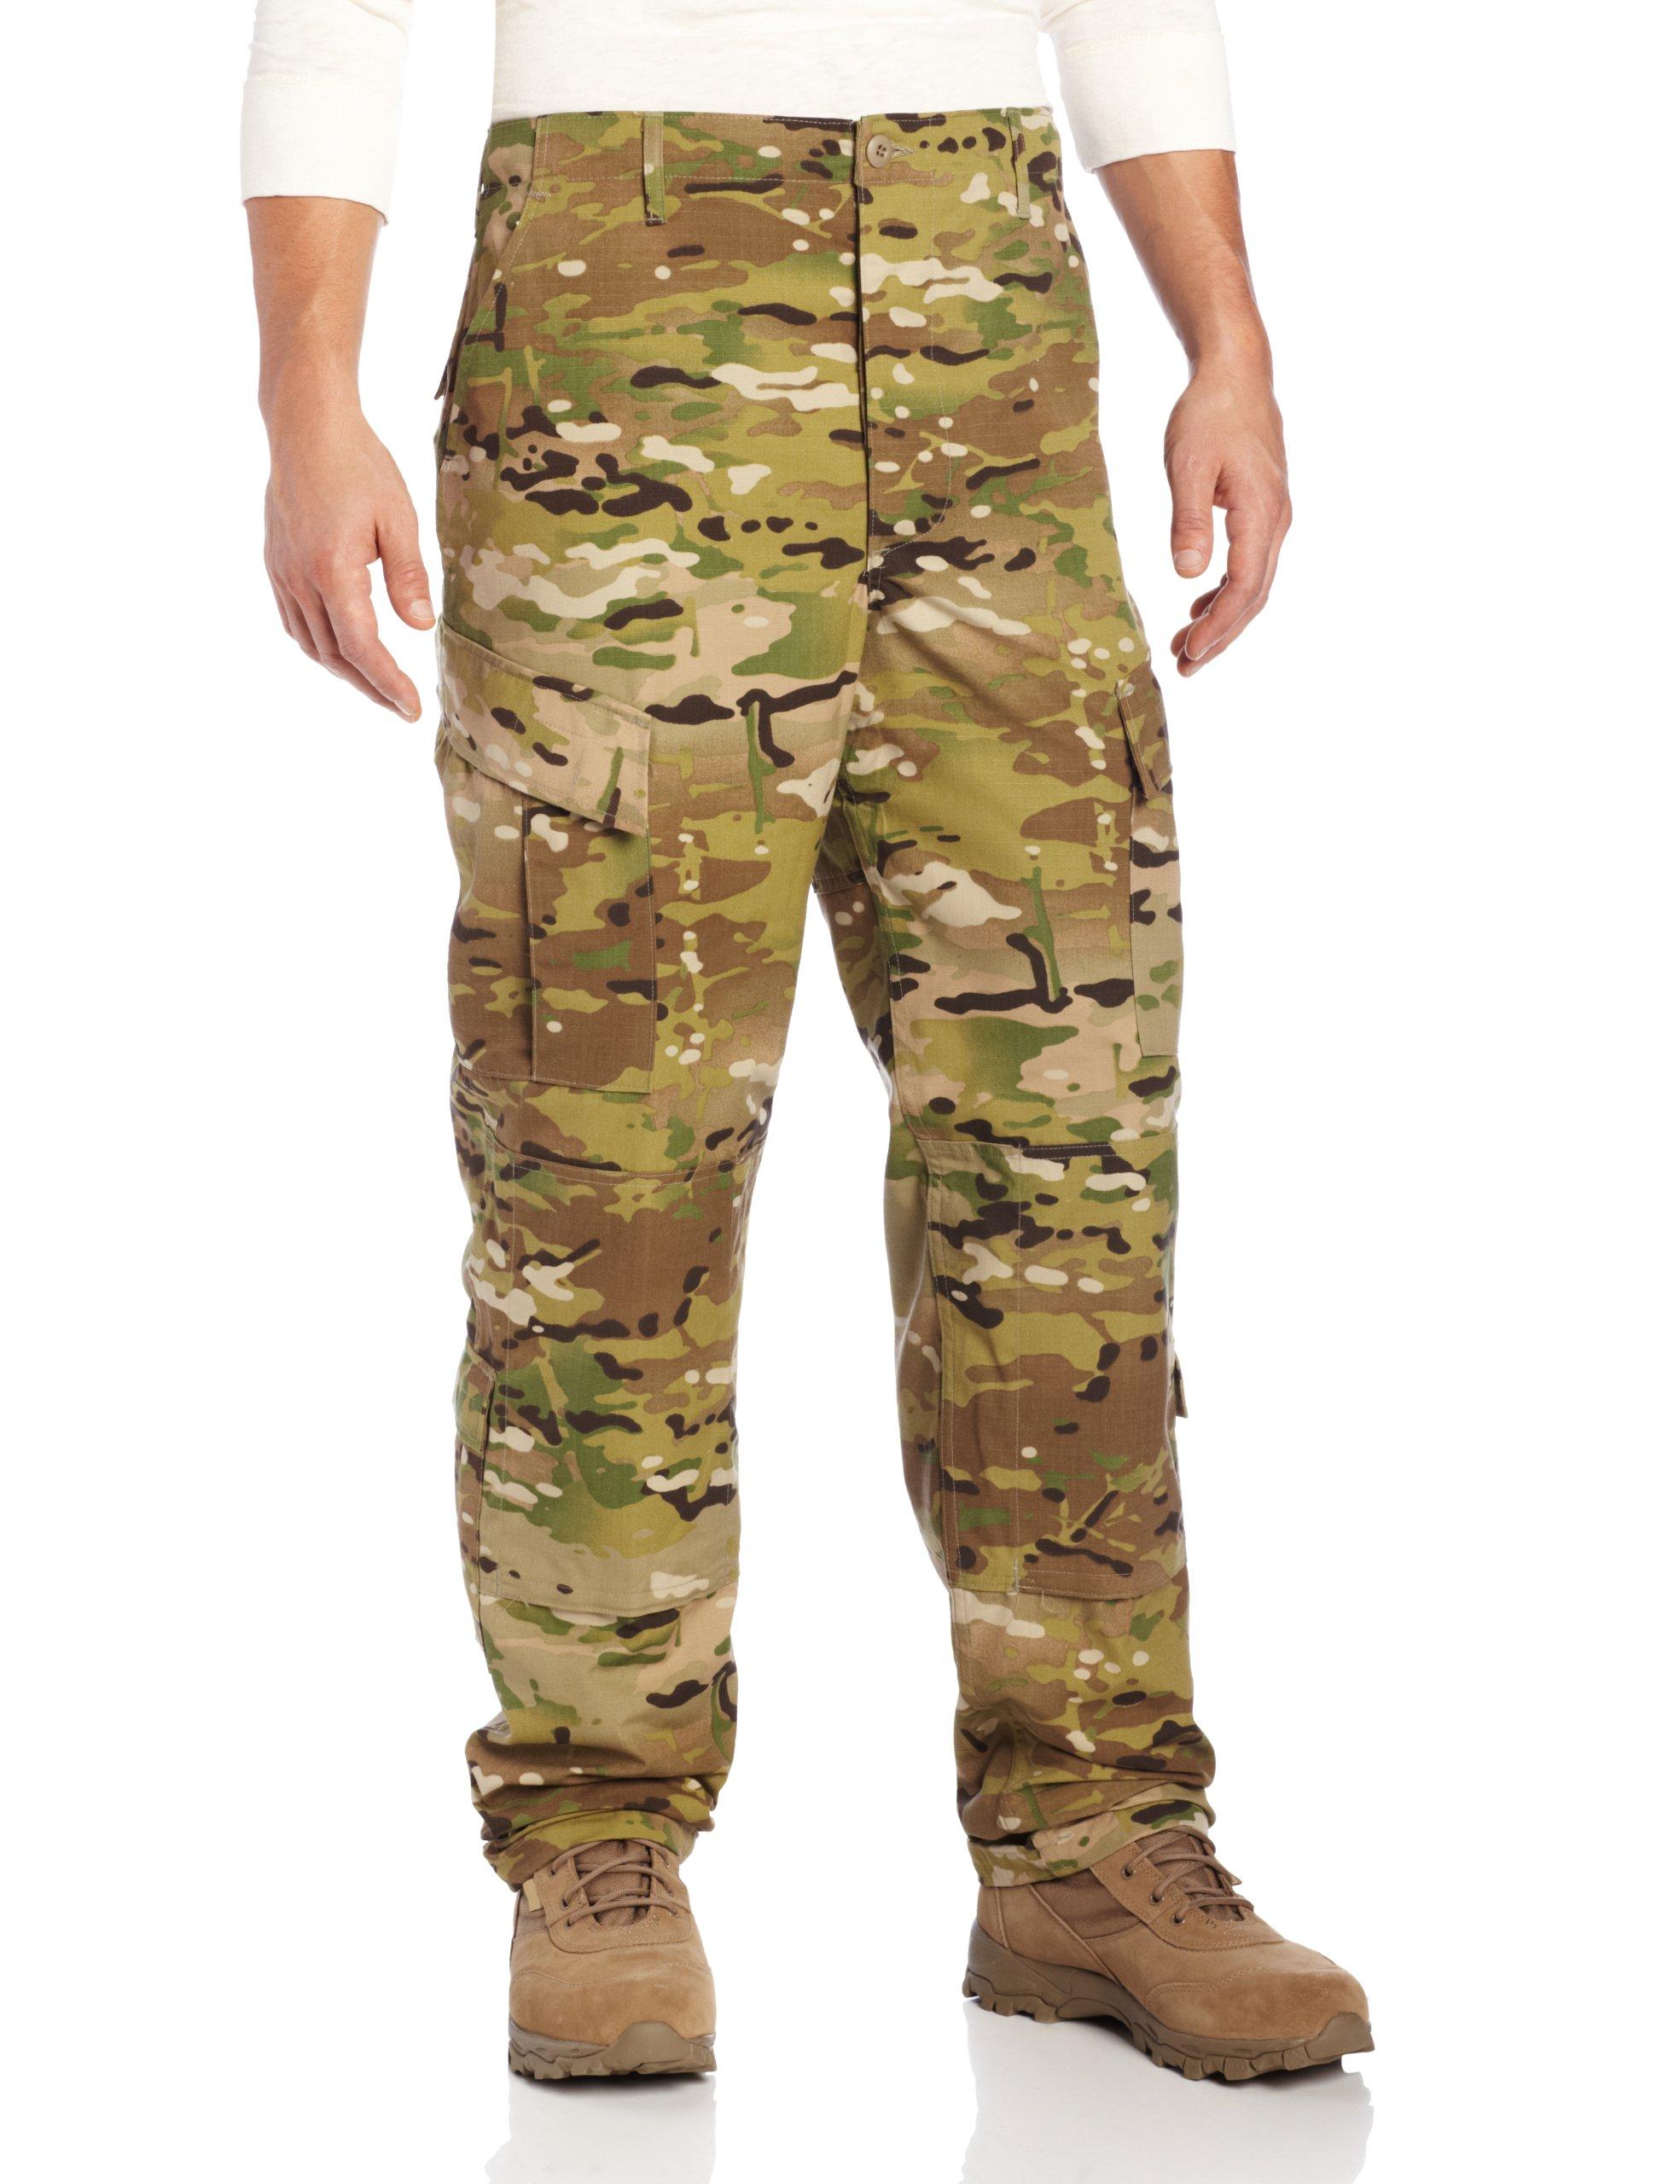 Propper Men's 50N/50C ACU Trouser, MultiCam, Medium Long